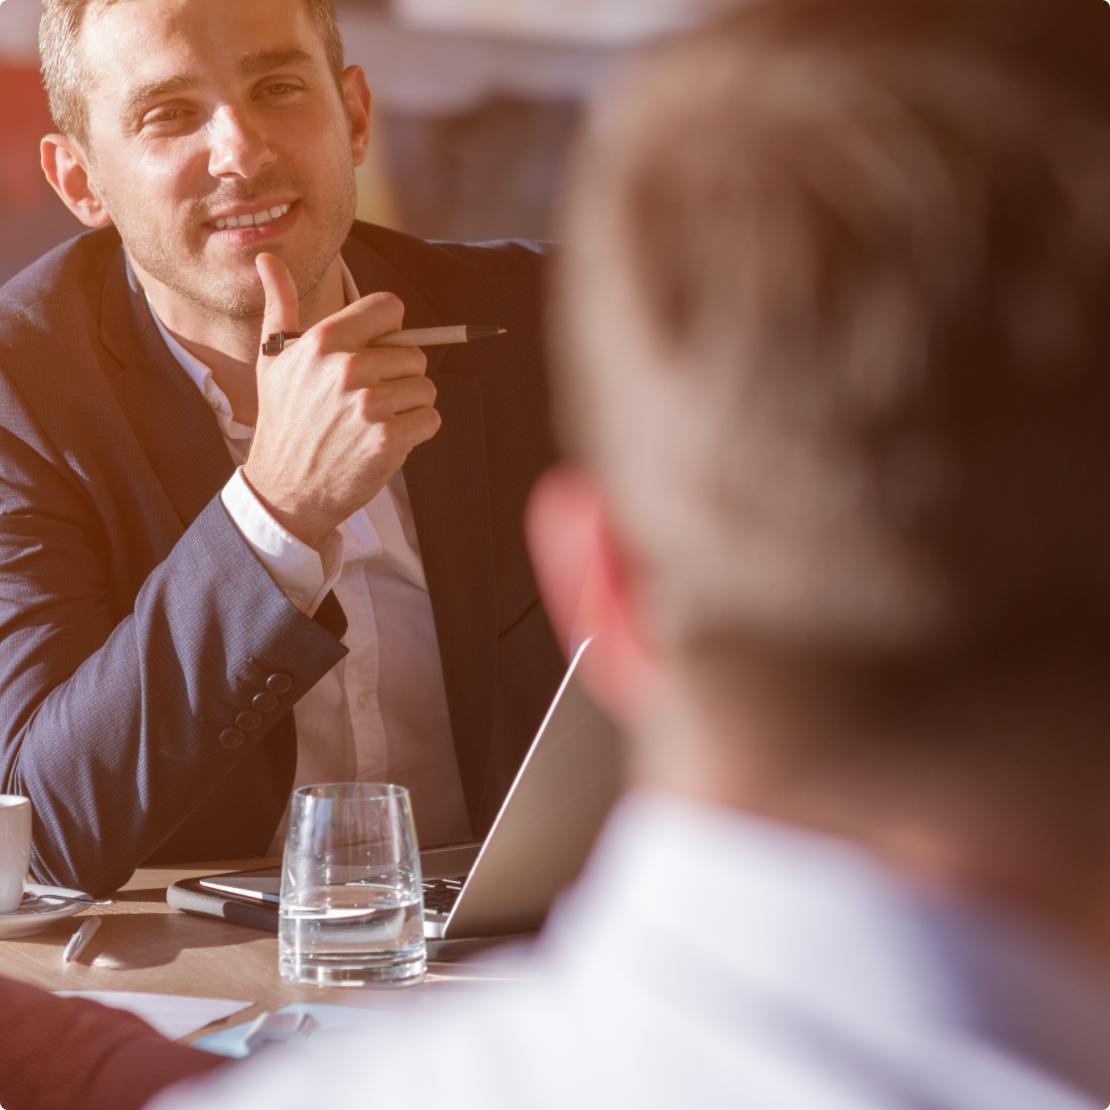 no-ordinary-hospitality-management-relationships